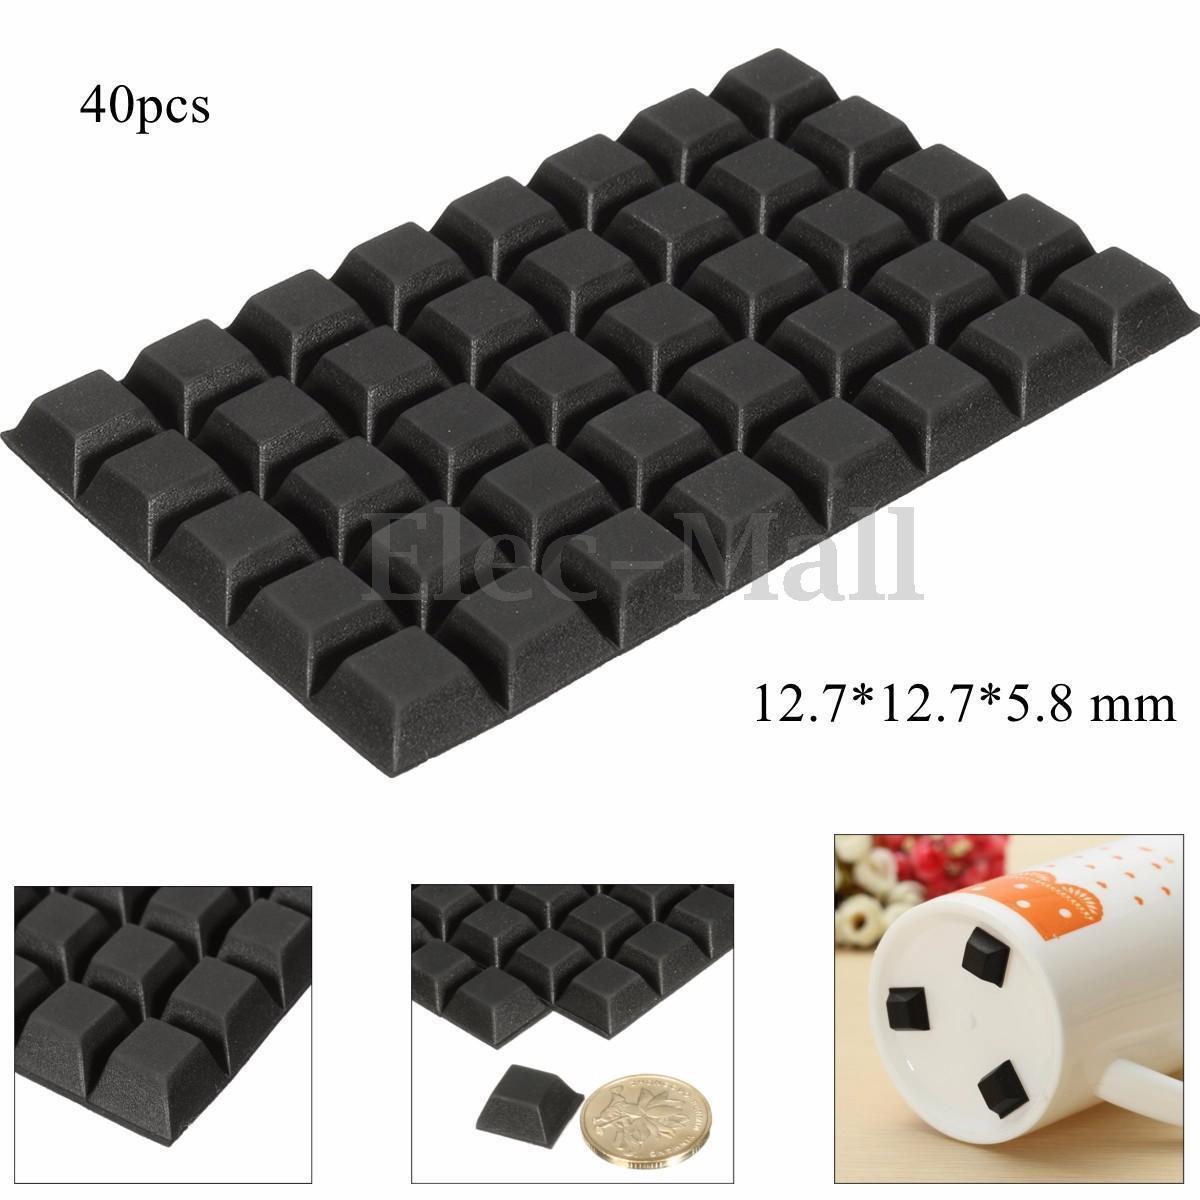 40pcs Self Adhesive Rubber Feet Bumper Door Furniture Buffer Pad Non Slip  Black | EBay